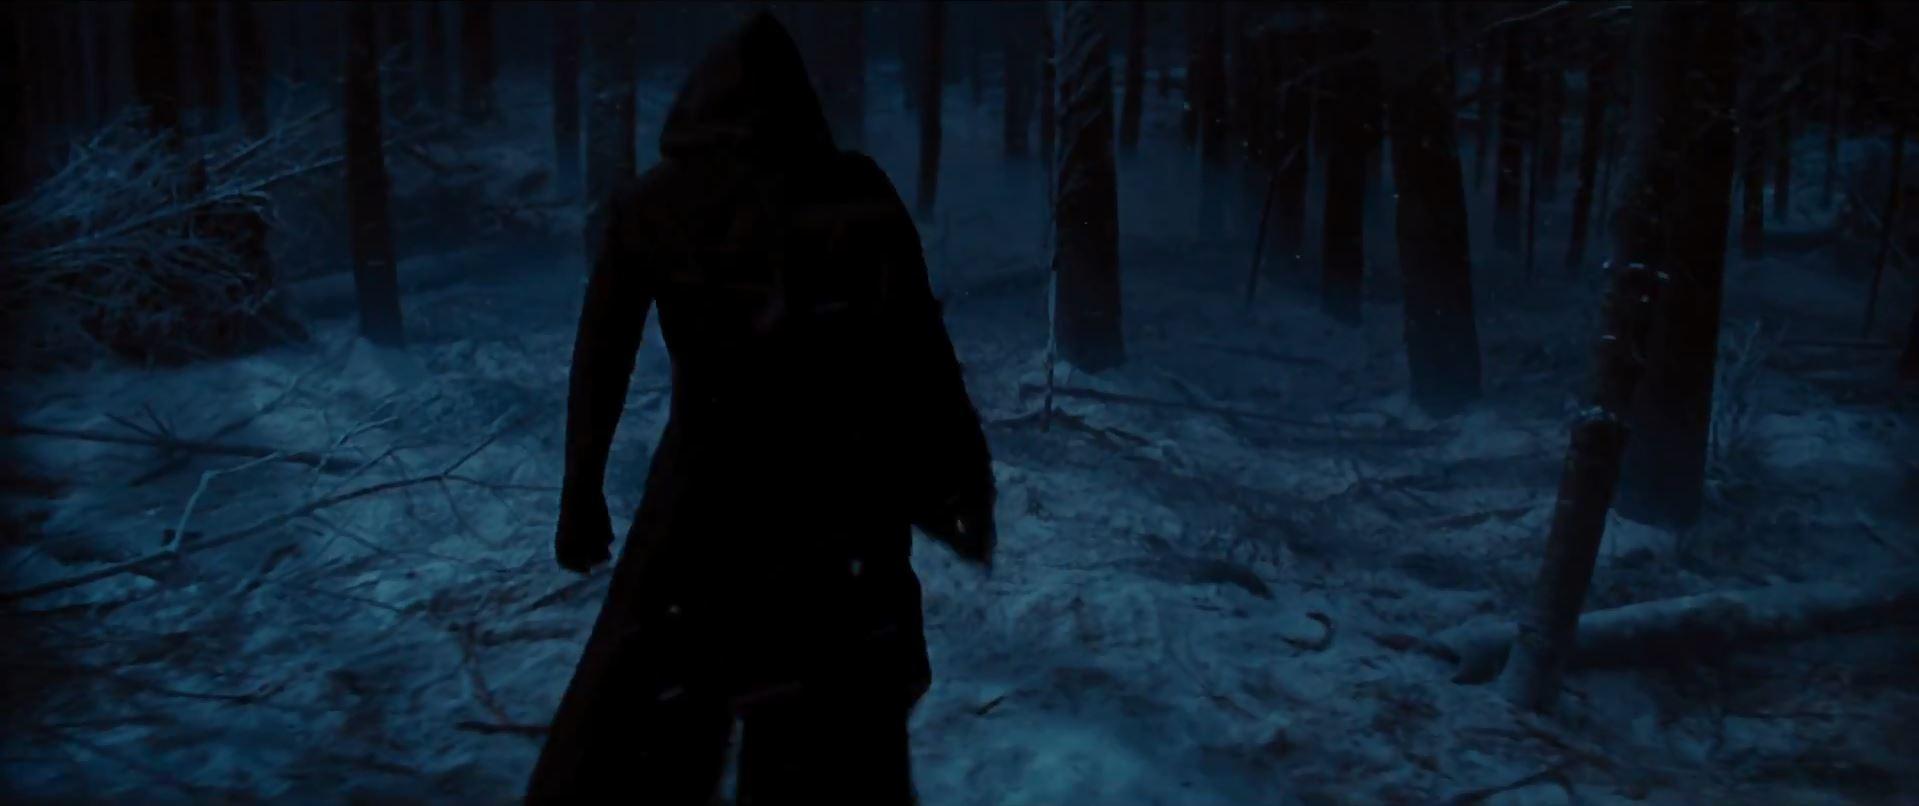 Villain in woods - Star Wars Episode 7 trailer released